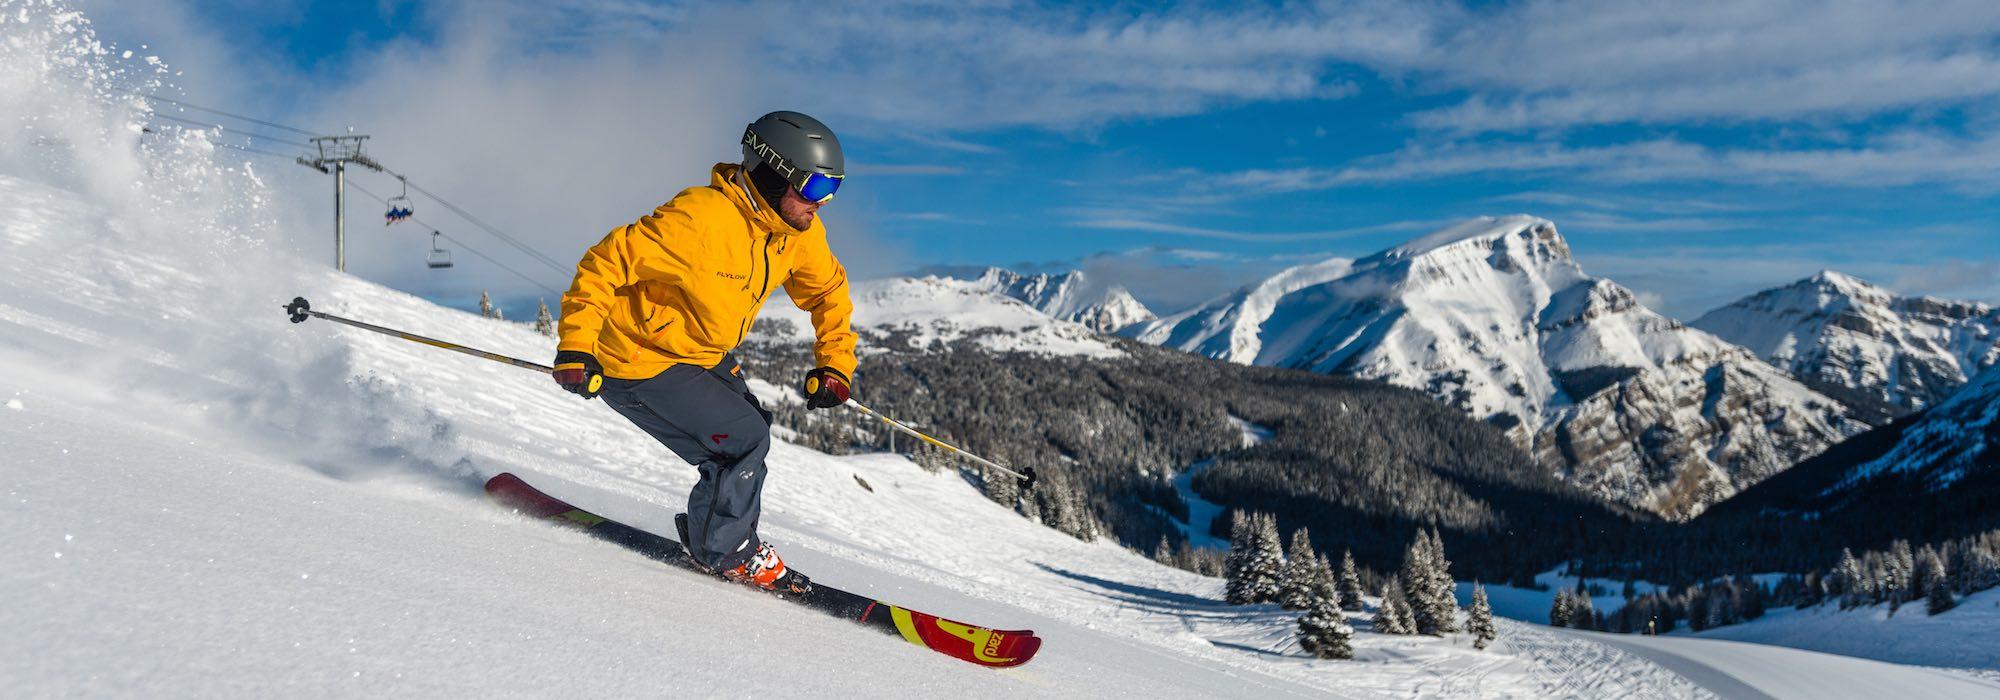 Five Ways to Maximize Your Ikon Pass in Banff & Lake Louise - SkiBig3